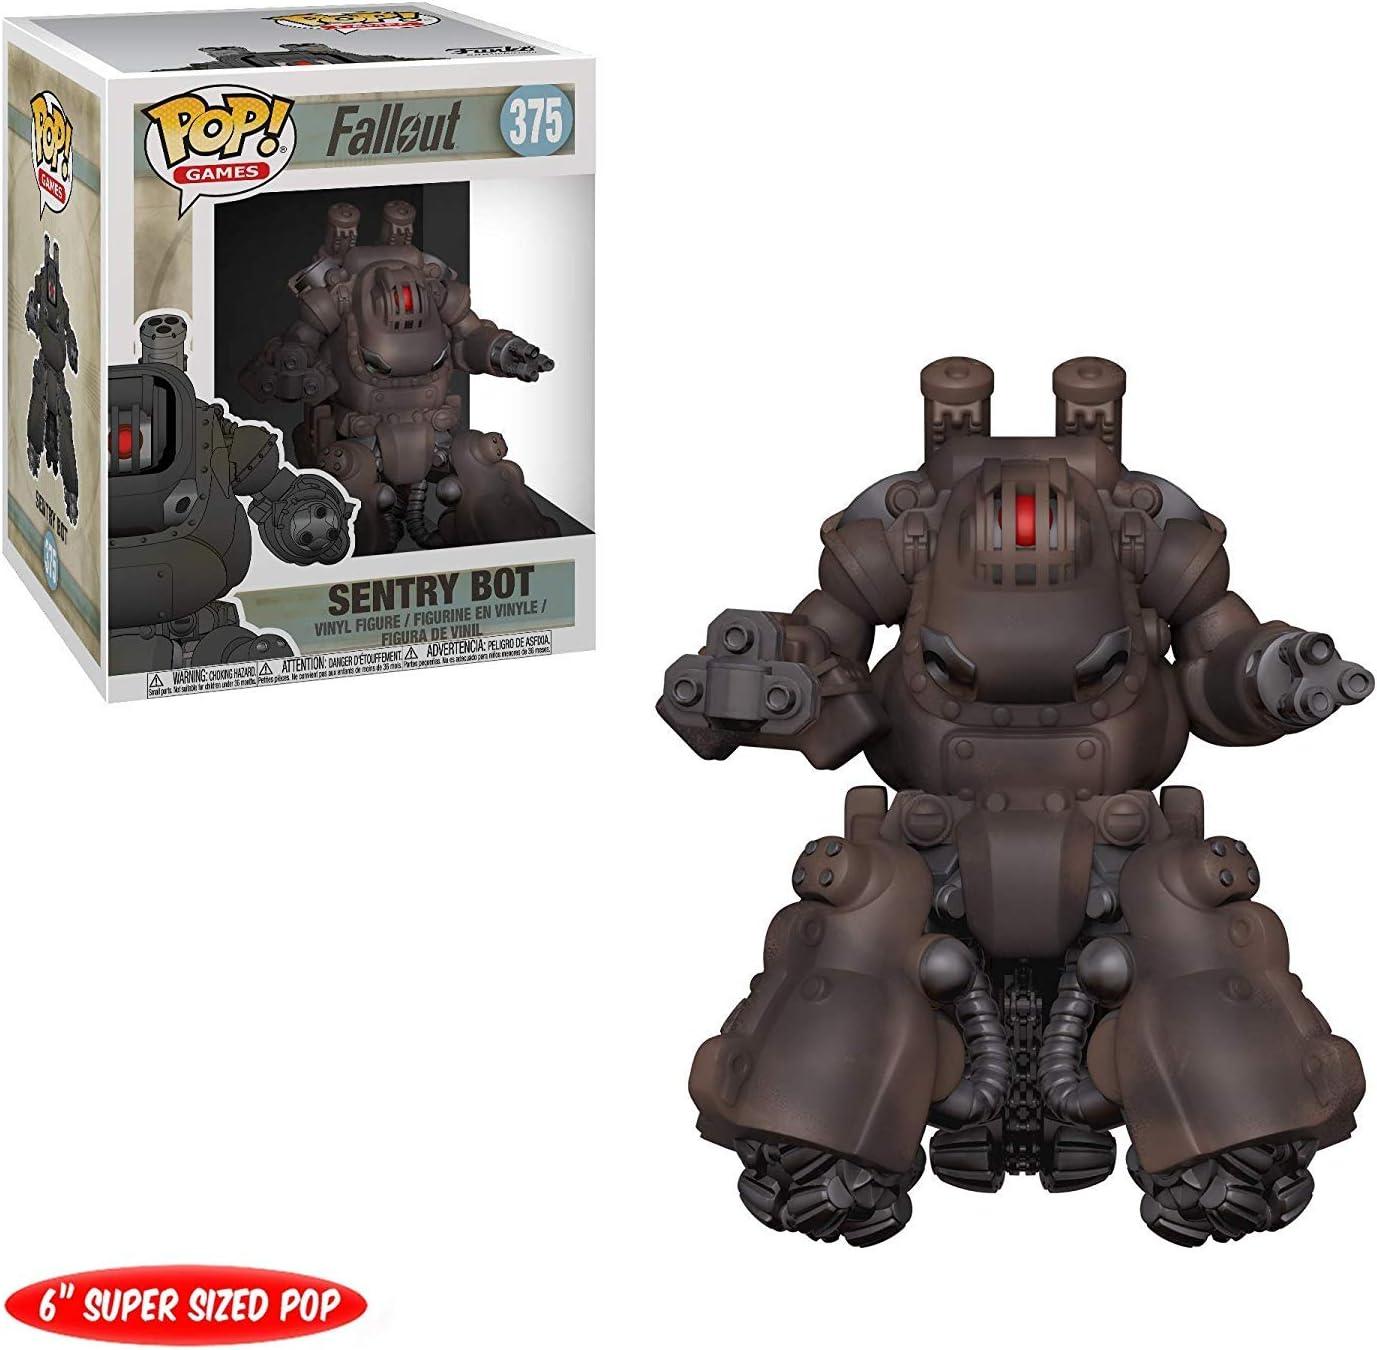 Amazon.com: Games: Fallout - Sentry Bot 6